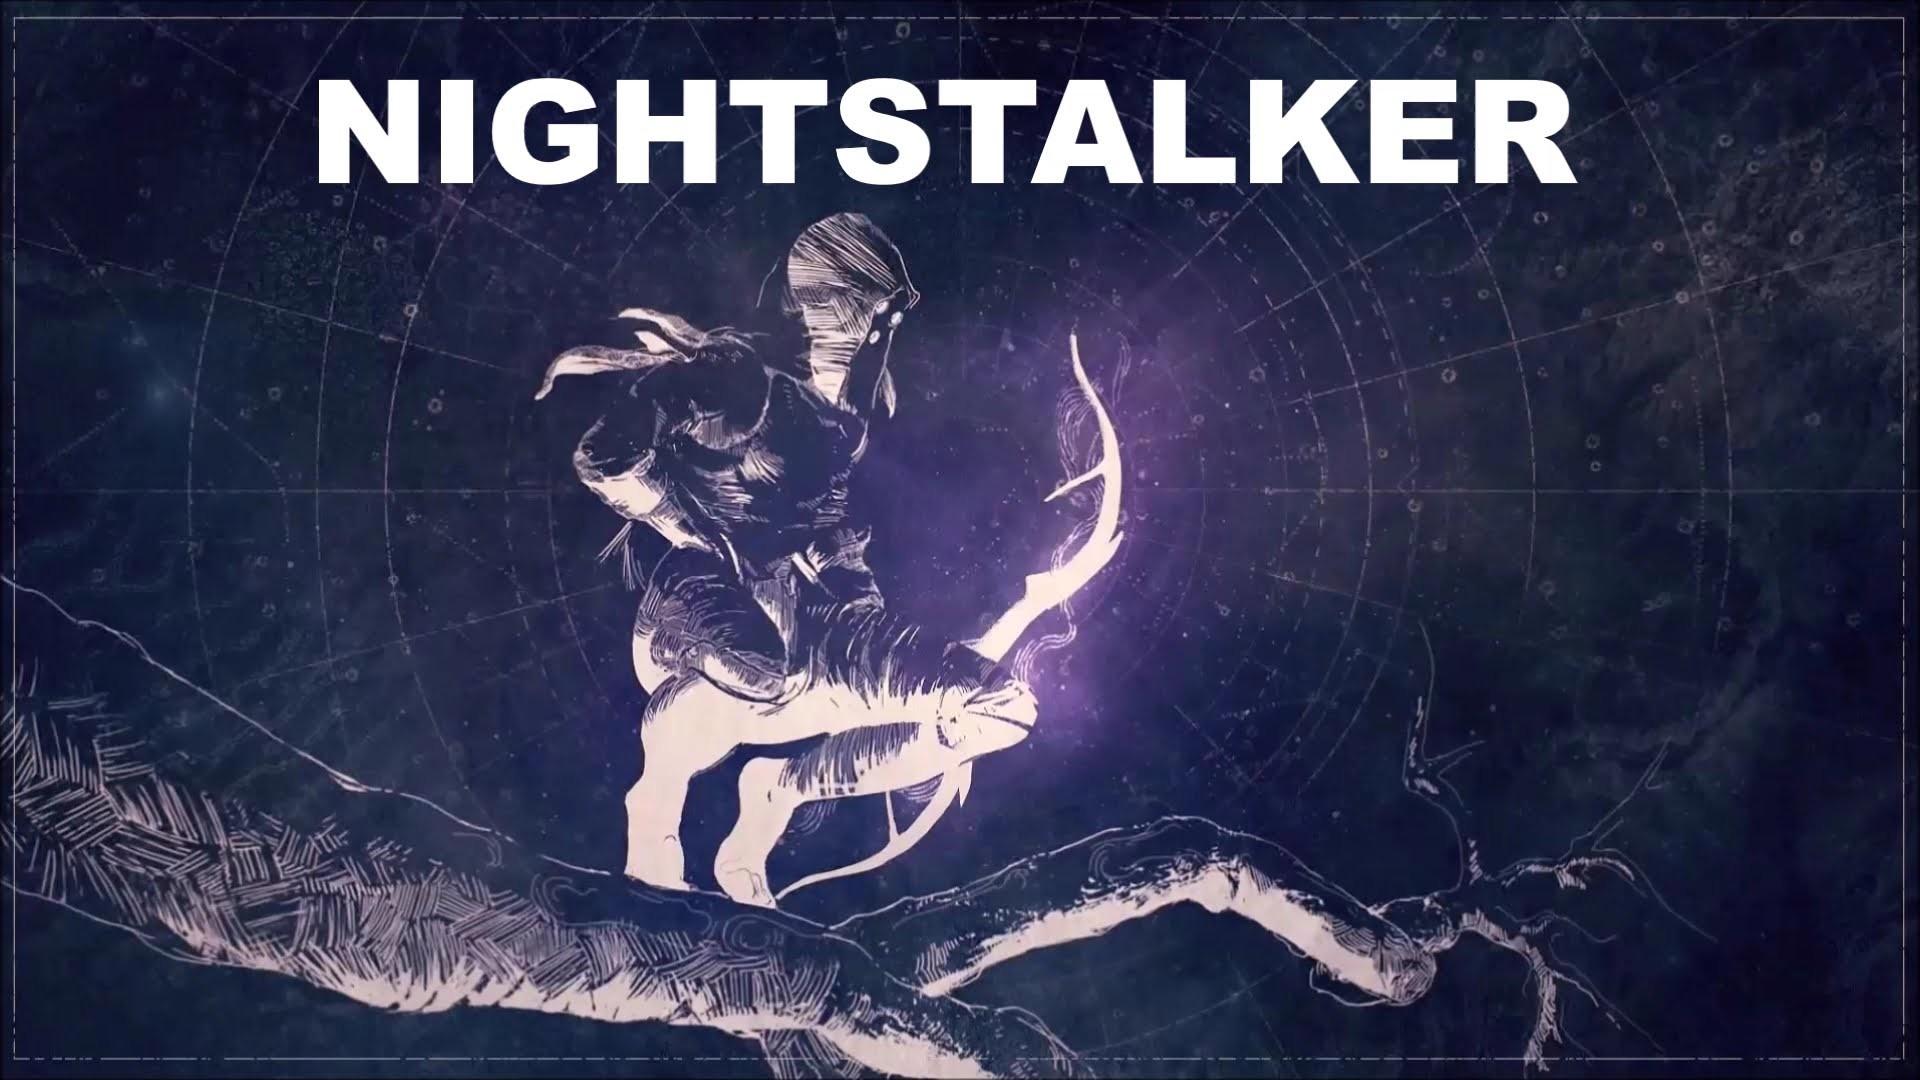 destiny night stalker wallpaper 87 images